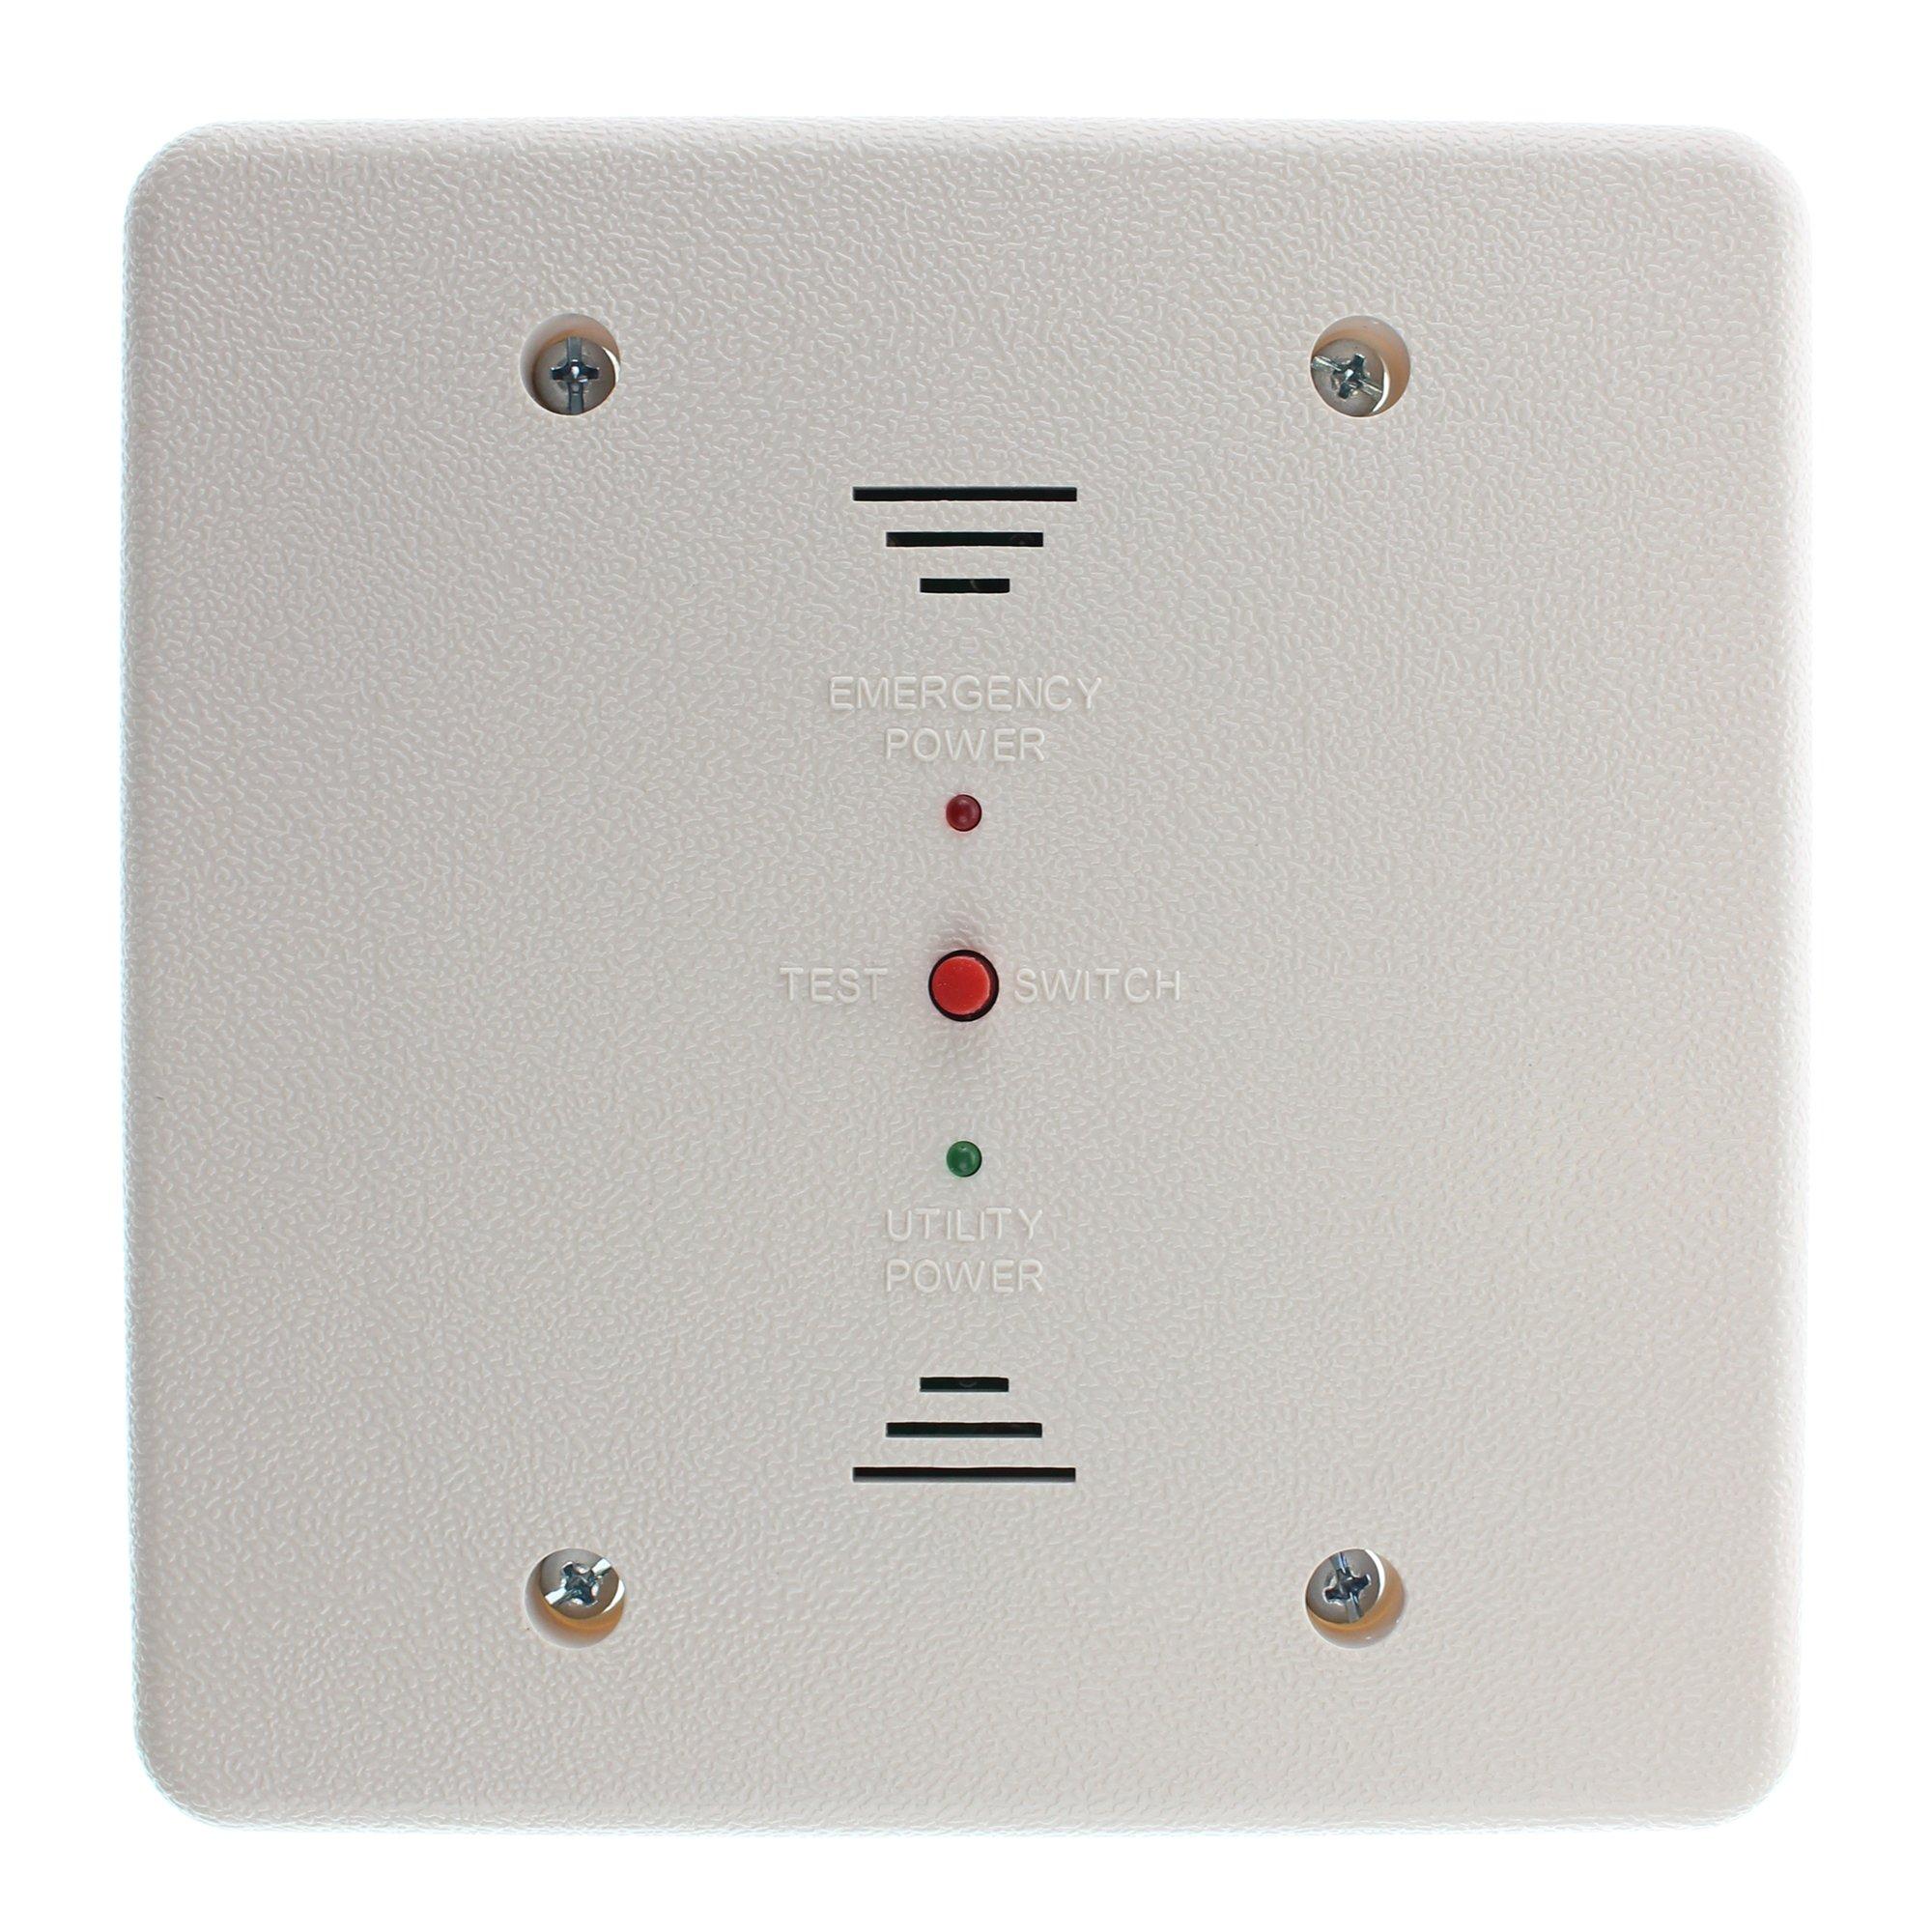 LVS Controls EPC-D-F-277V Automatic Emergency Lighting Power Control, 277V by LVS Controls